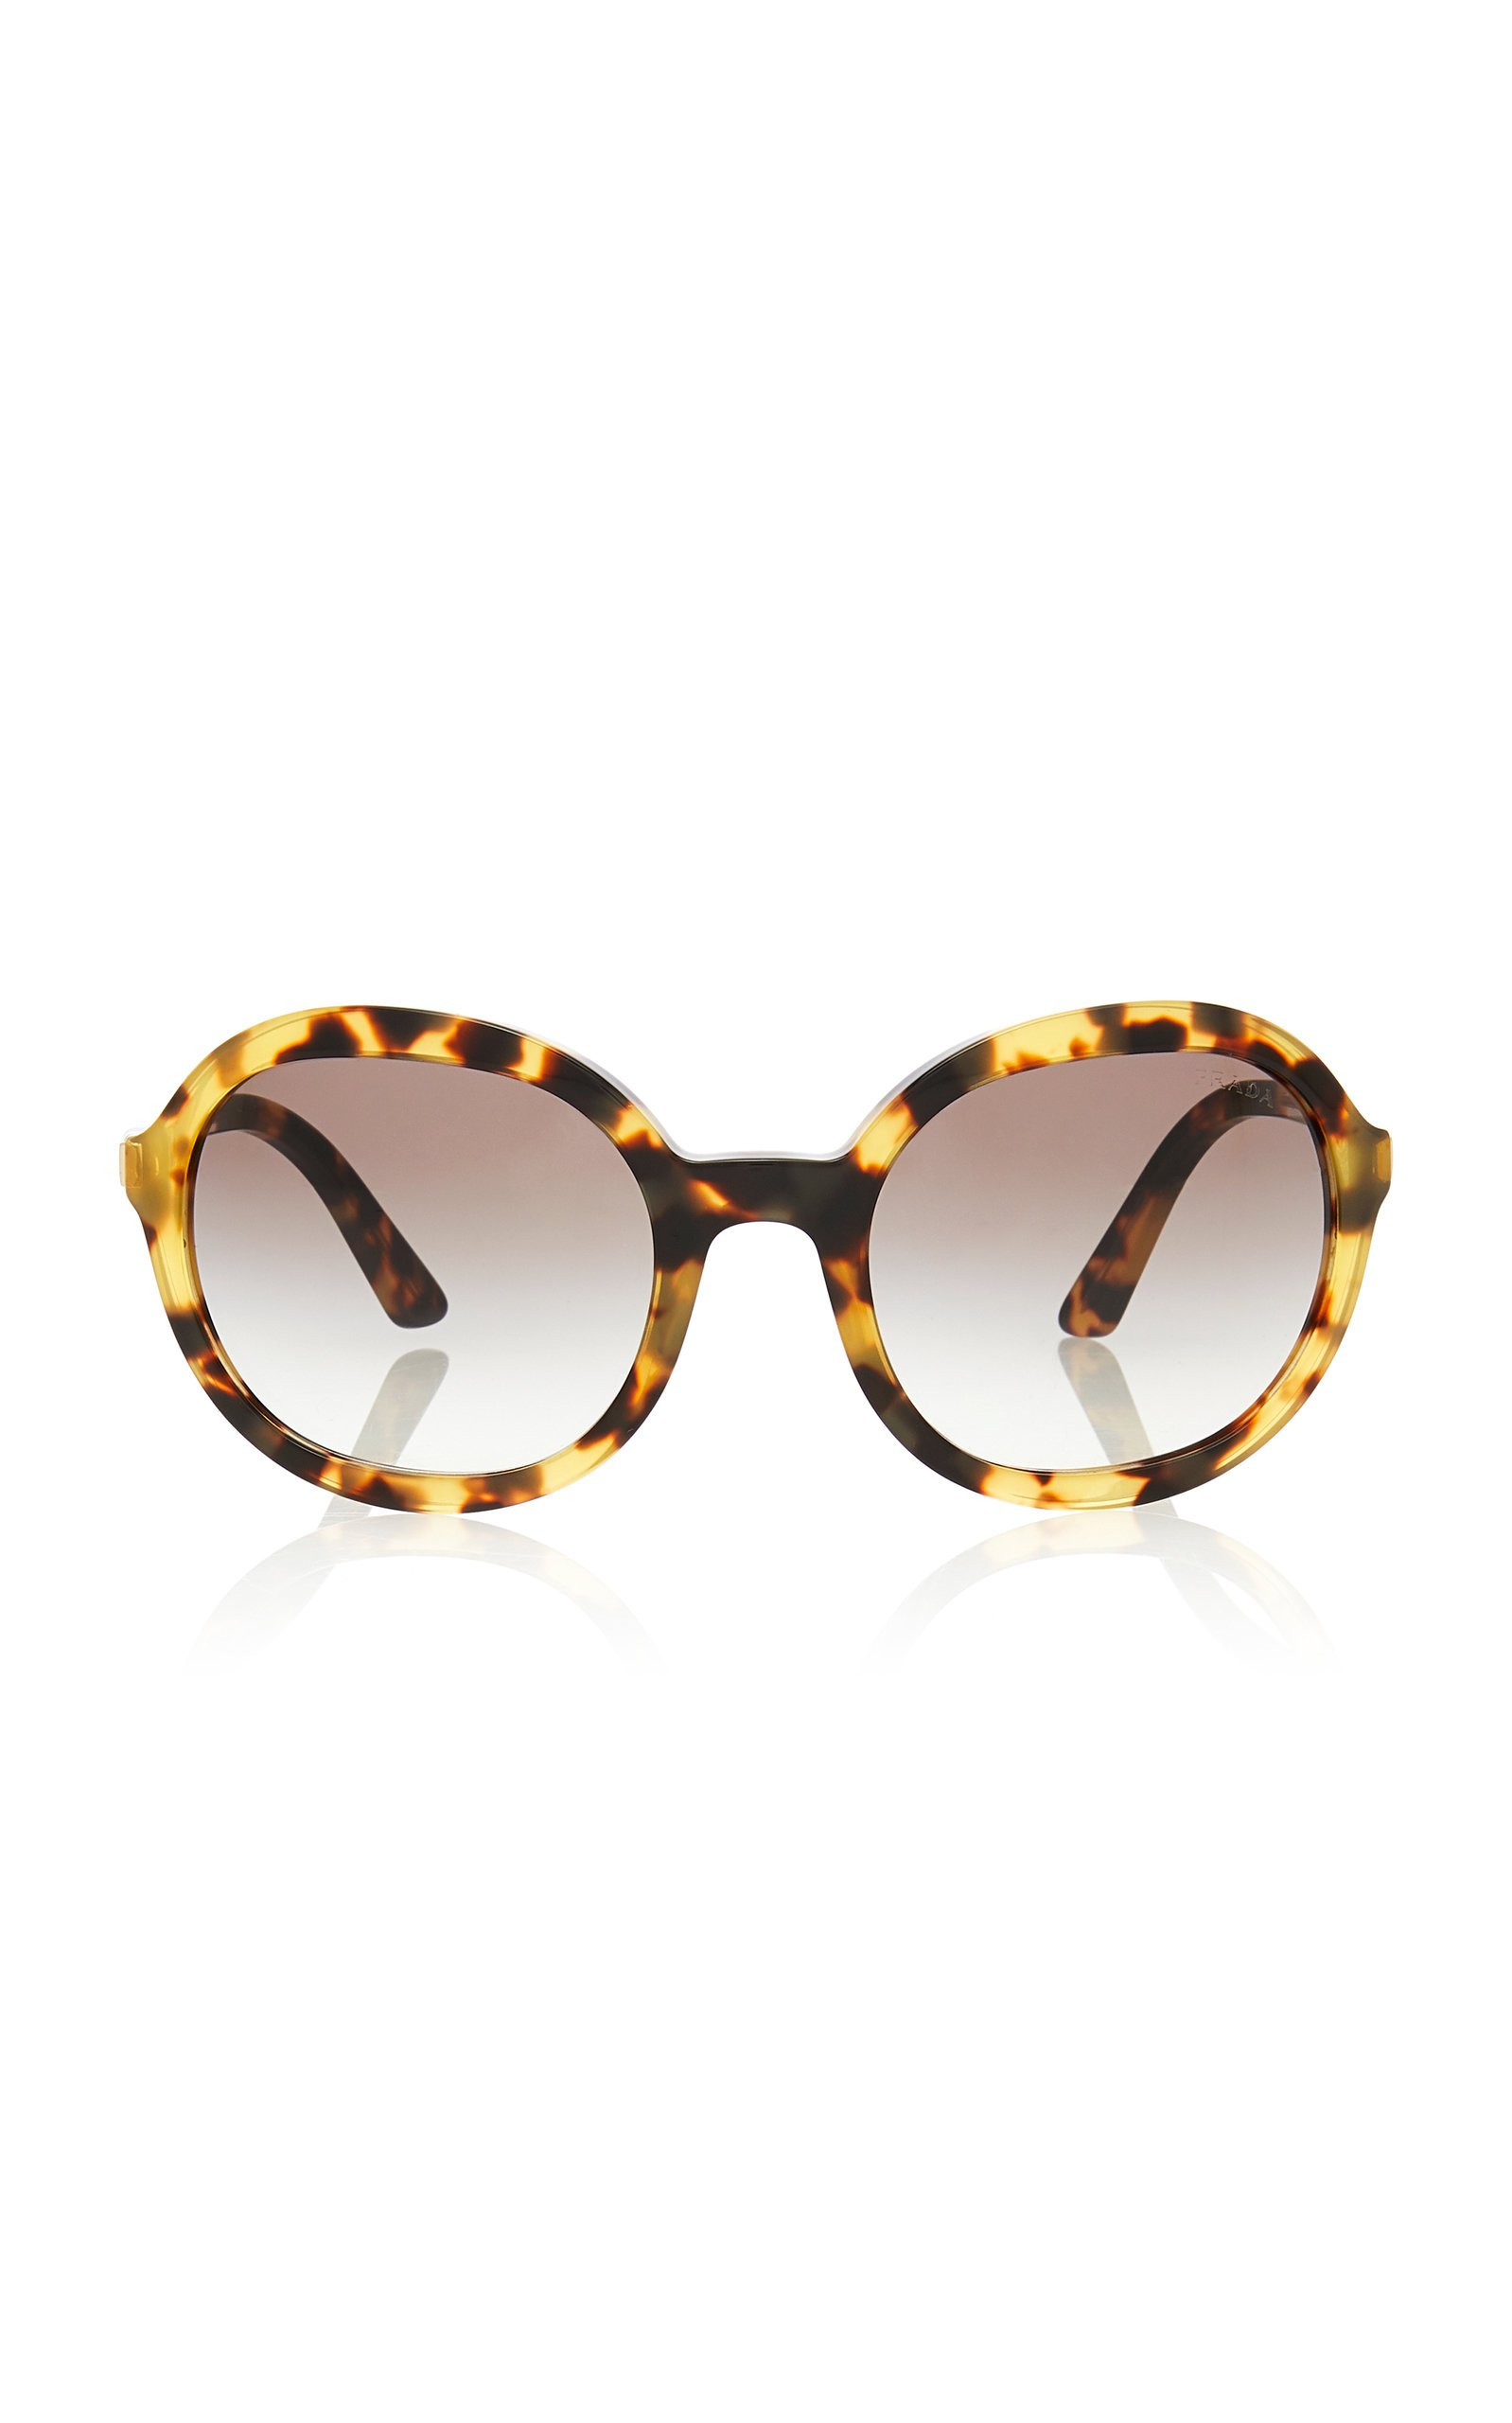 Prada Round-Frame Tortoiseshell Acetate Sunglasses